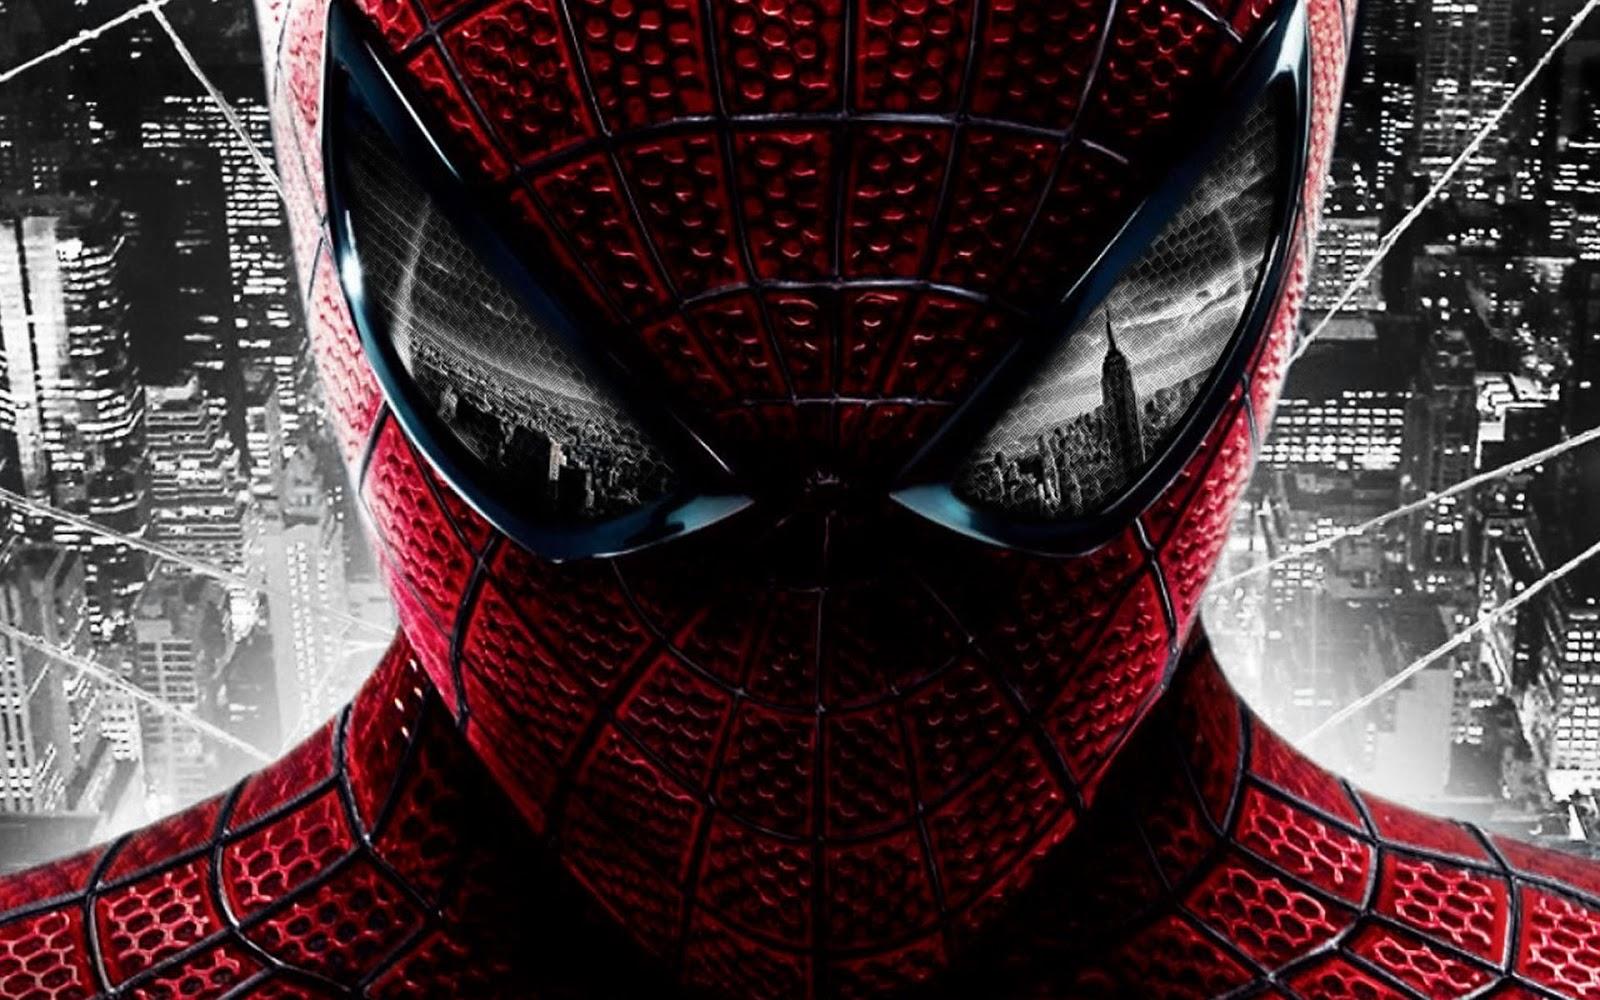 Fond d'écran the amazing spider man - Fonds d'écran HD